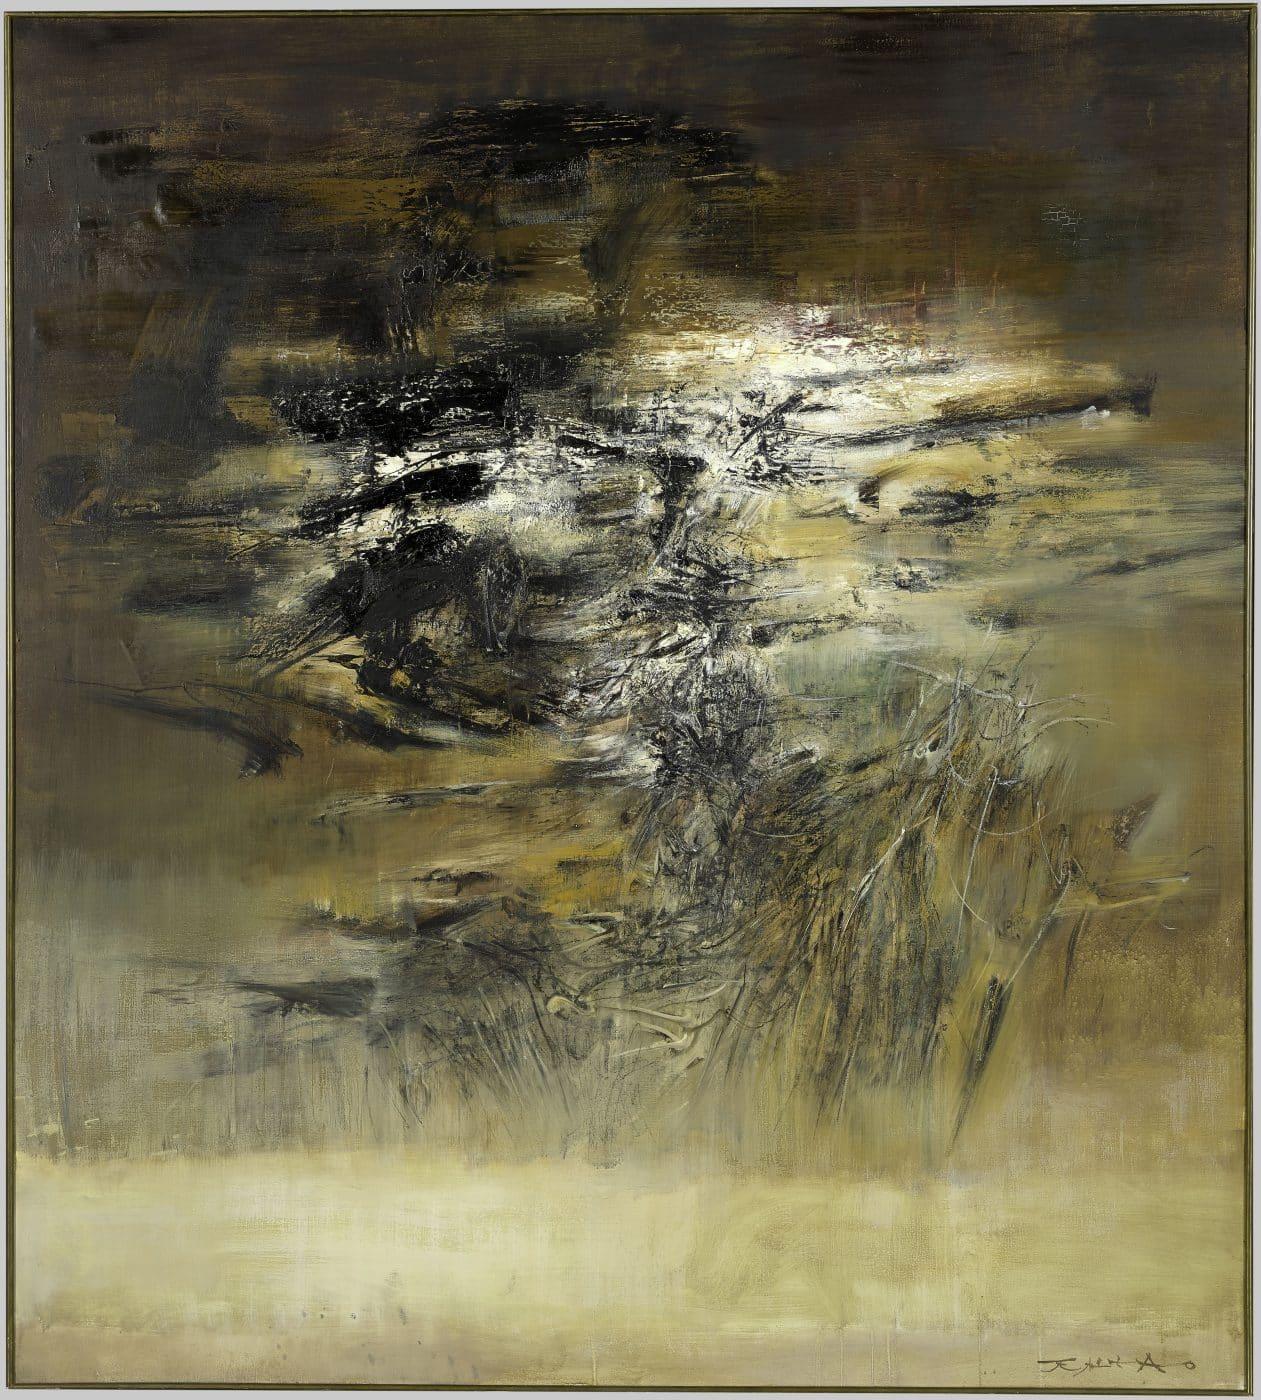 15.12.61, 1961, by Zao Wou-Ki